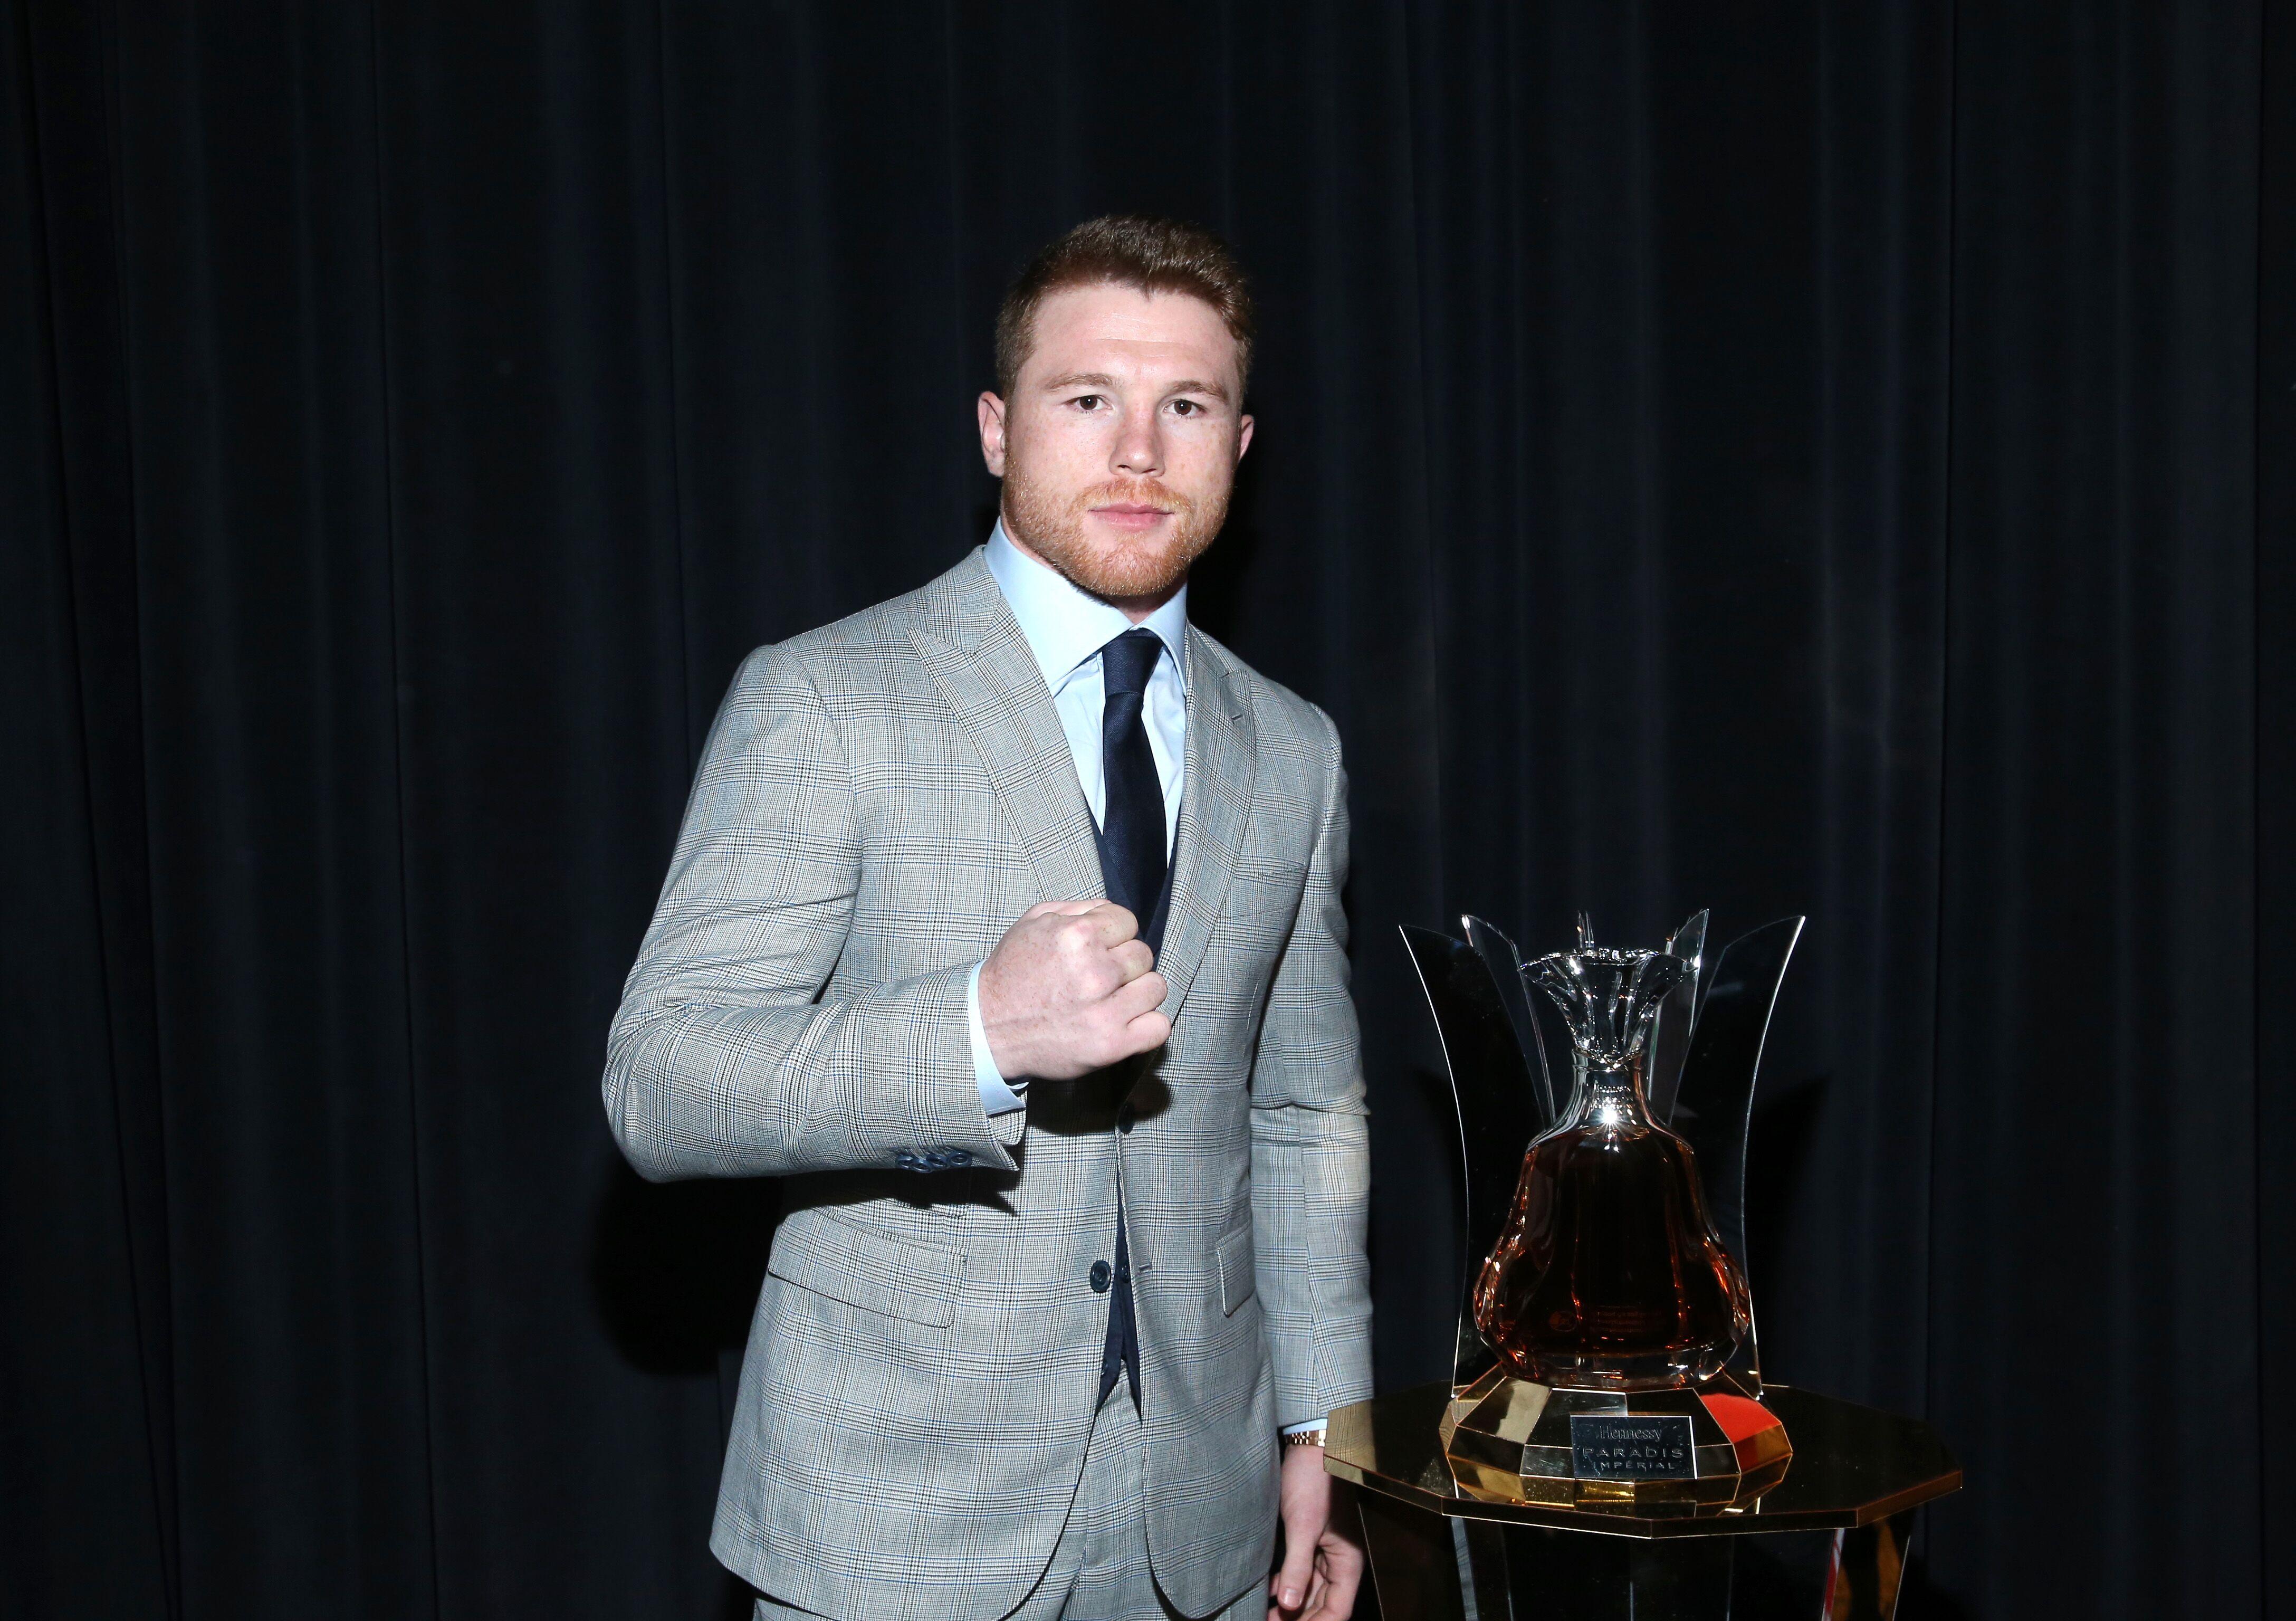 Canelo Alvarez: If Conor McGregor shocks the world, then we have a conversation